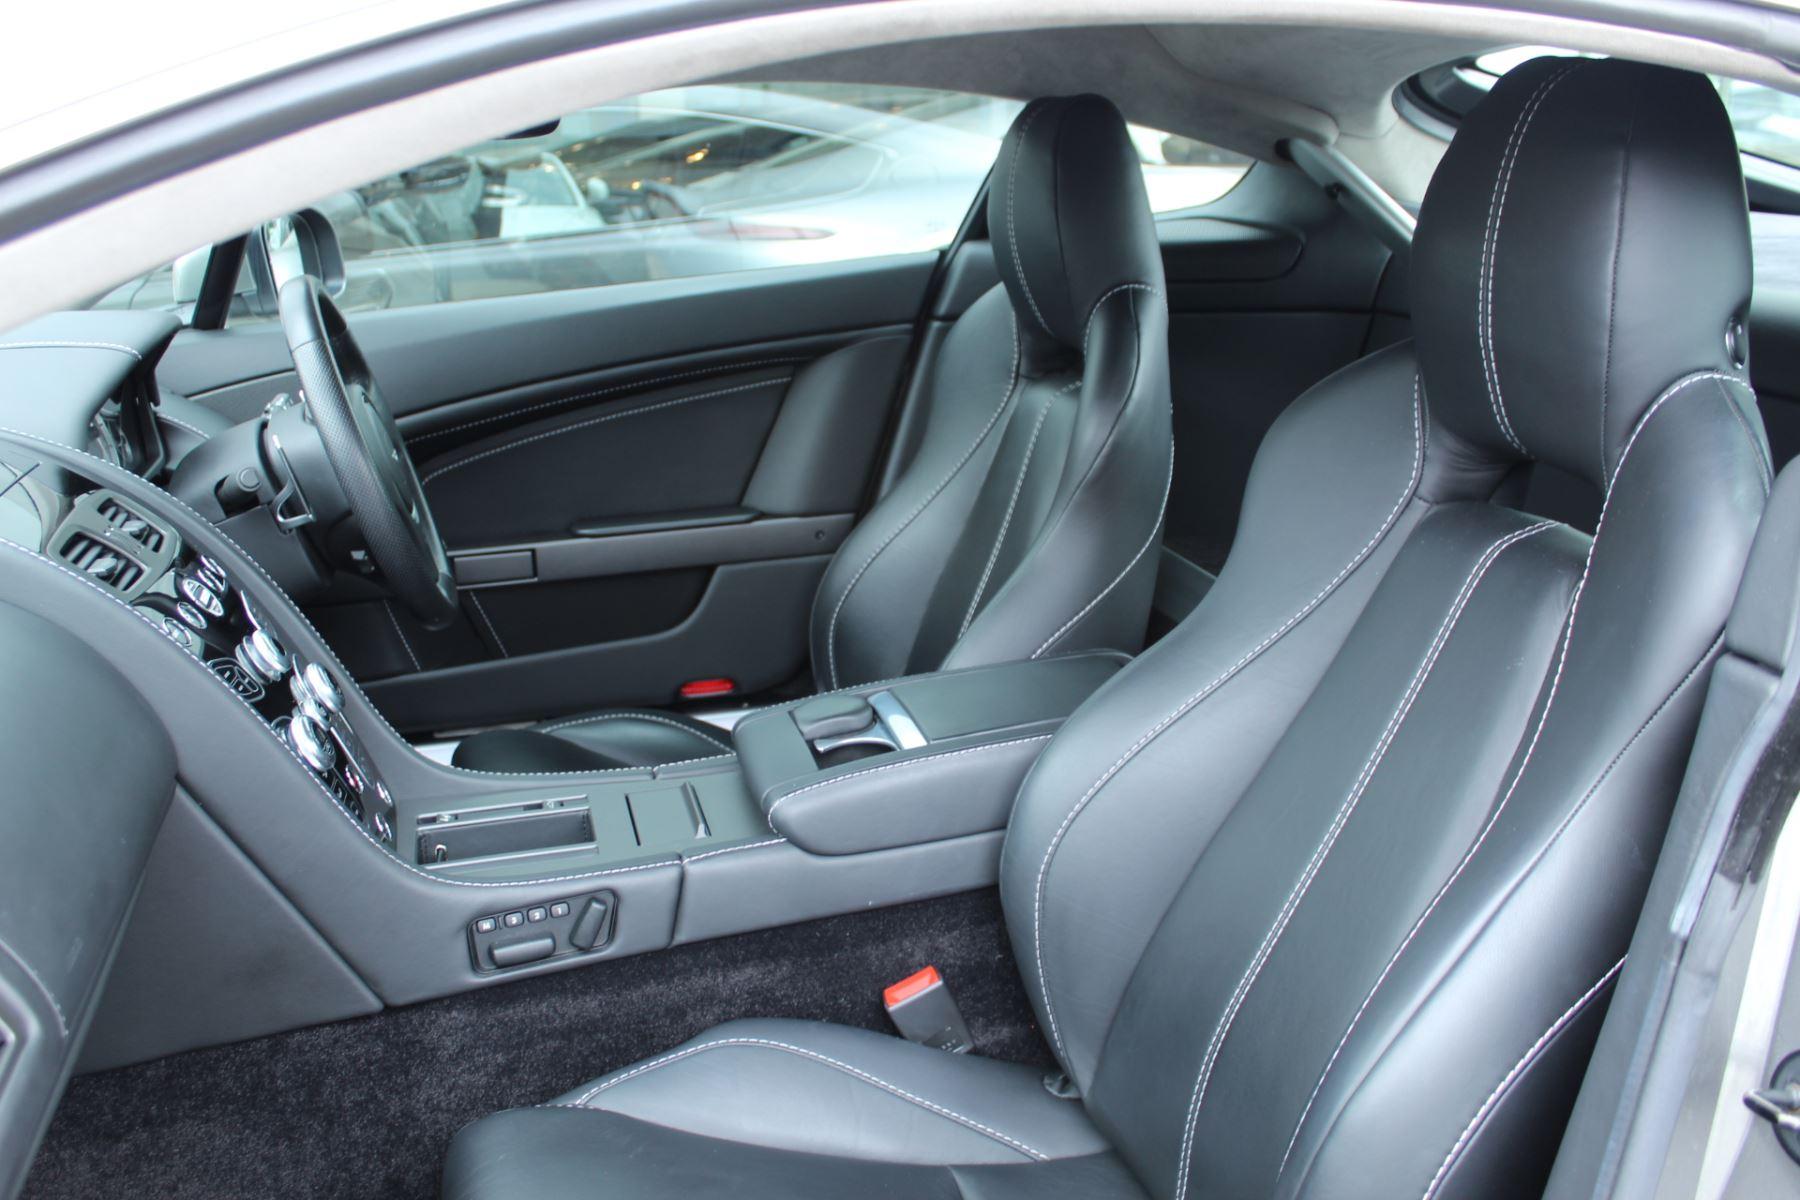 Aston Martin V8 Vantage Coupe 2dr Sportshift [420] image 21